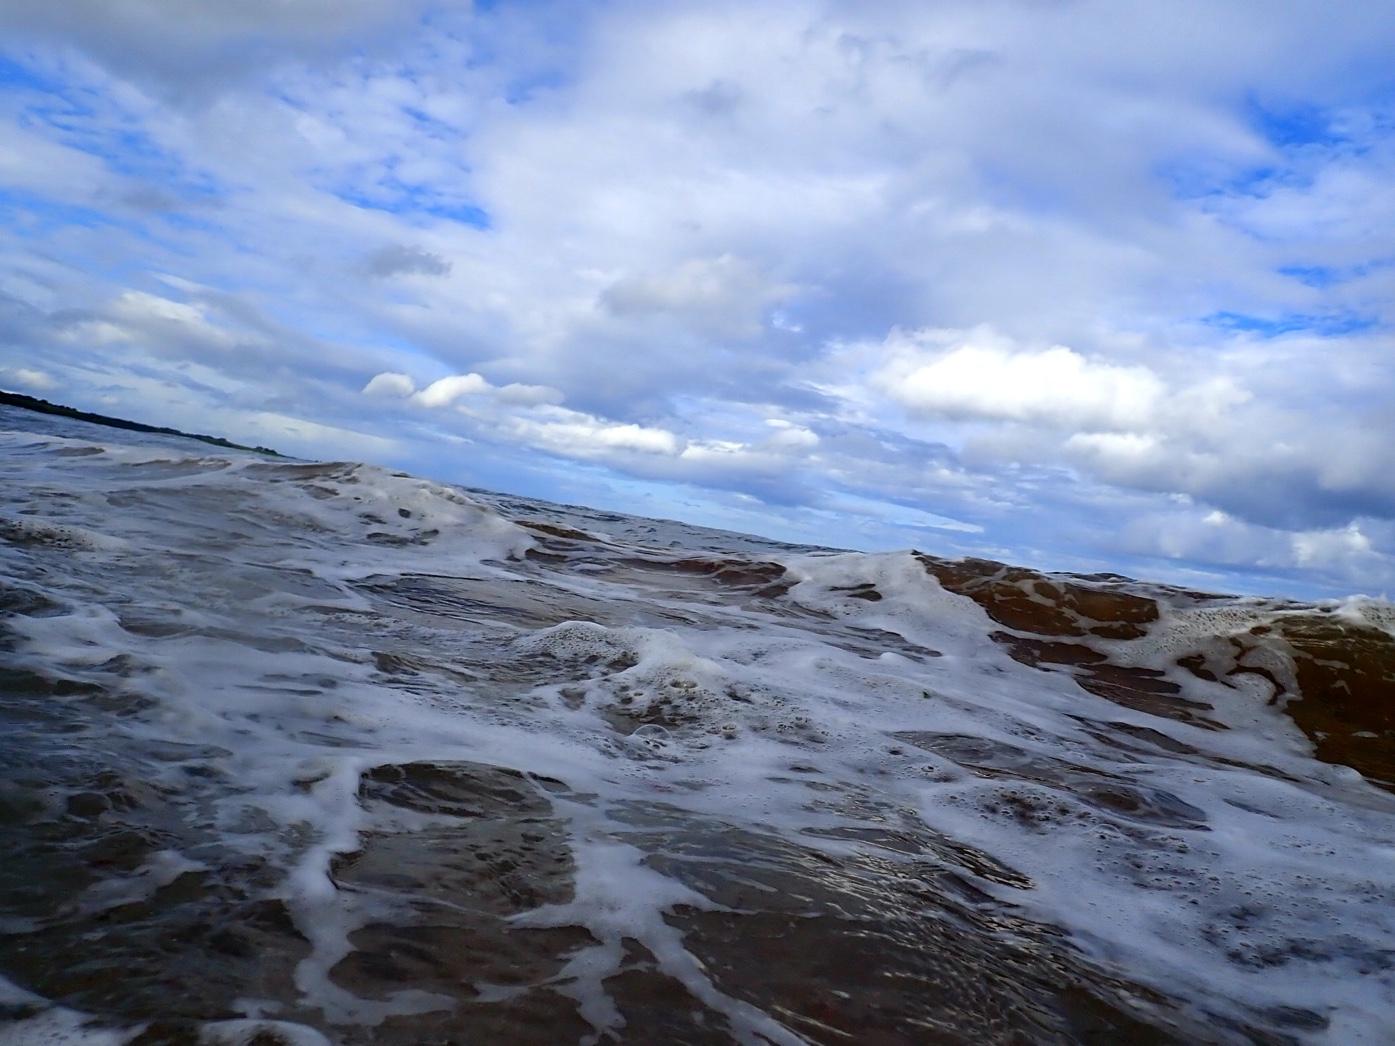 2013, HR Wallingford, Inch Cape, Metocean and Coastal Processes